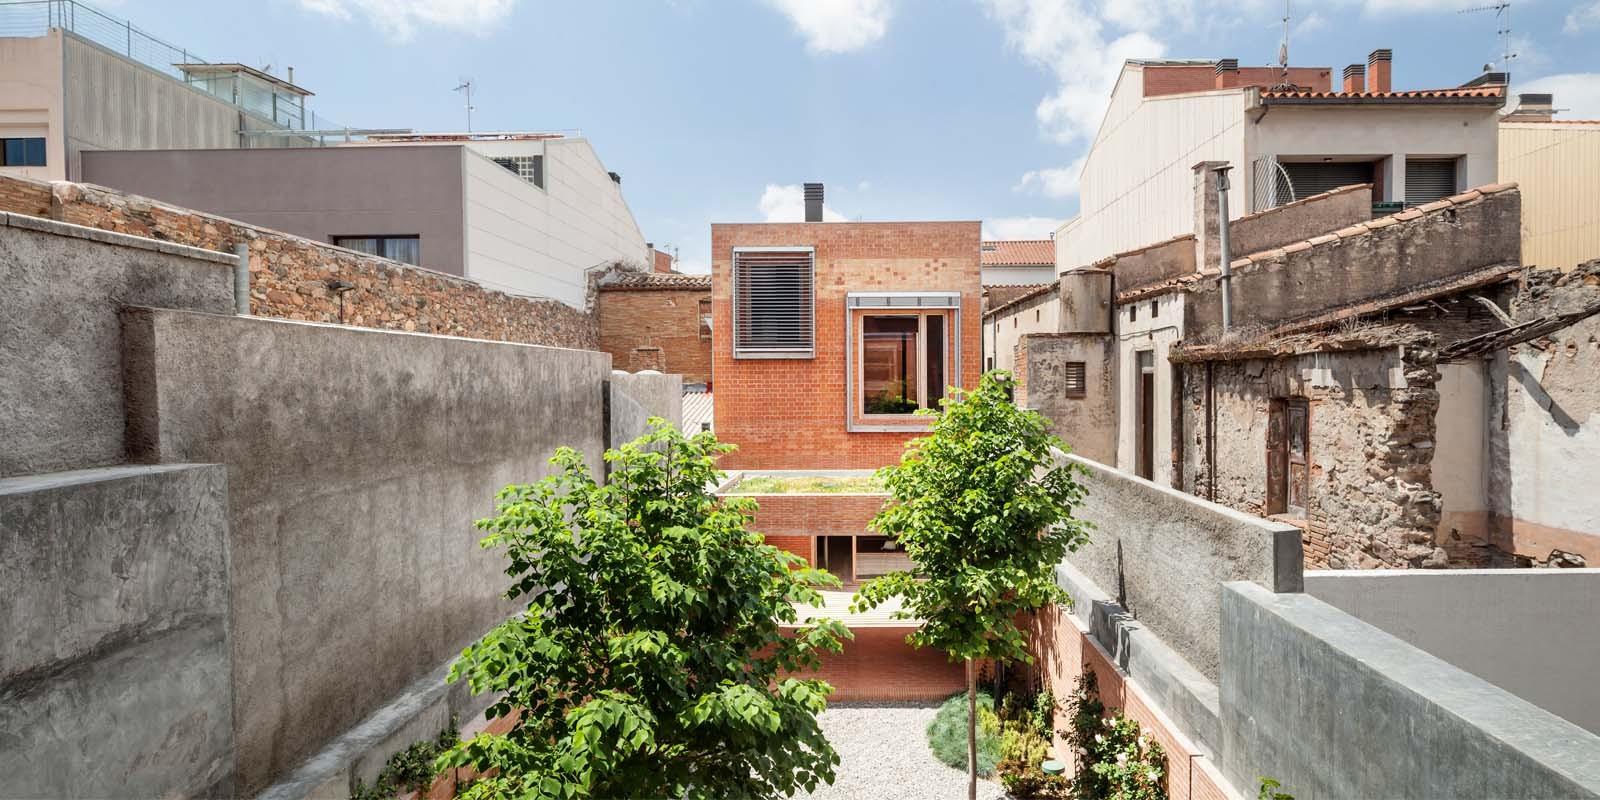 House 1014 / H Arquitectes, © Adrià Goula